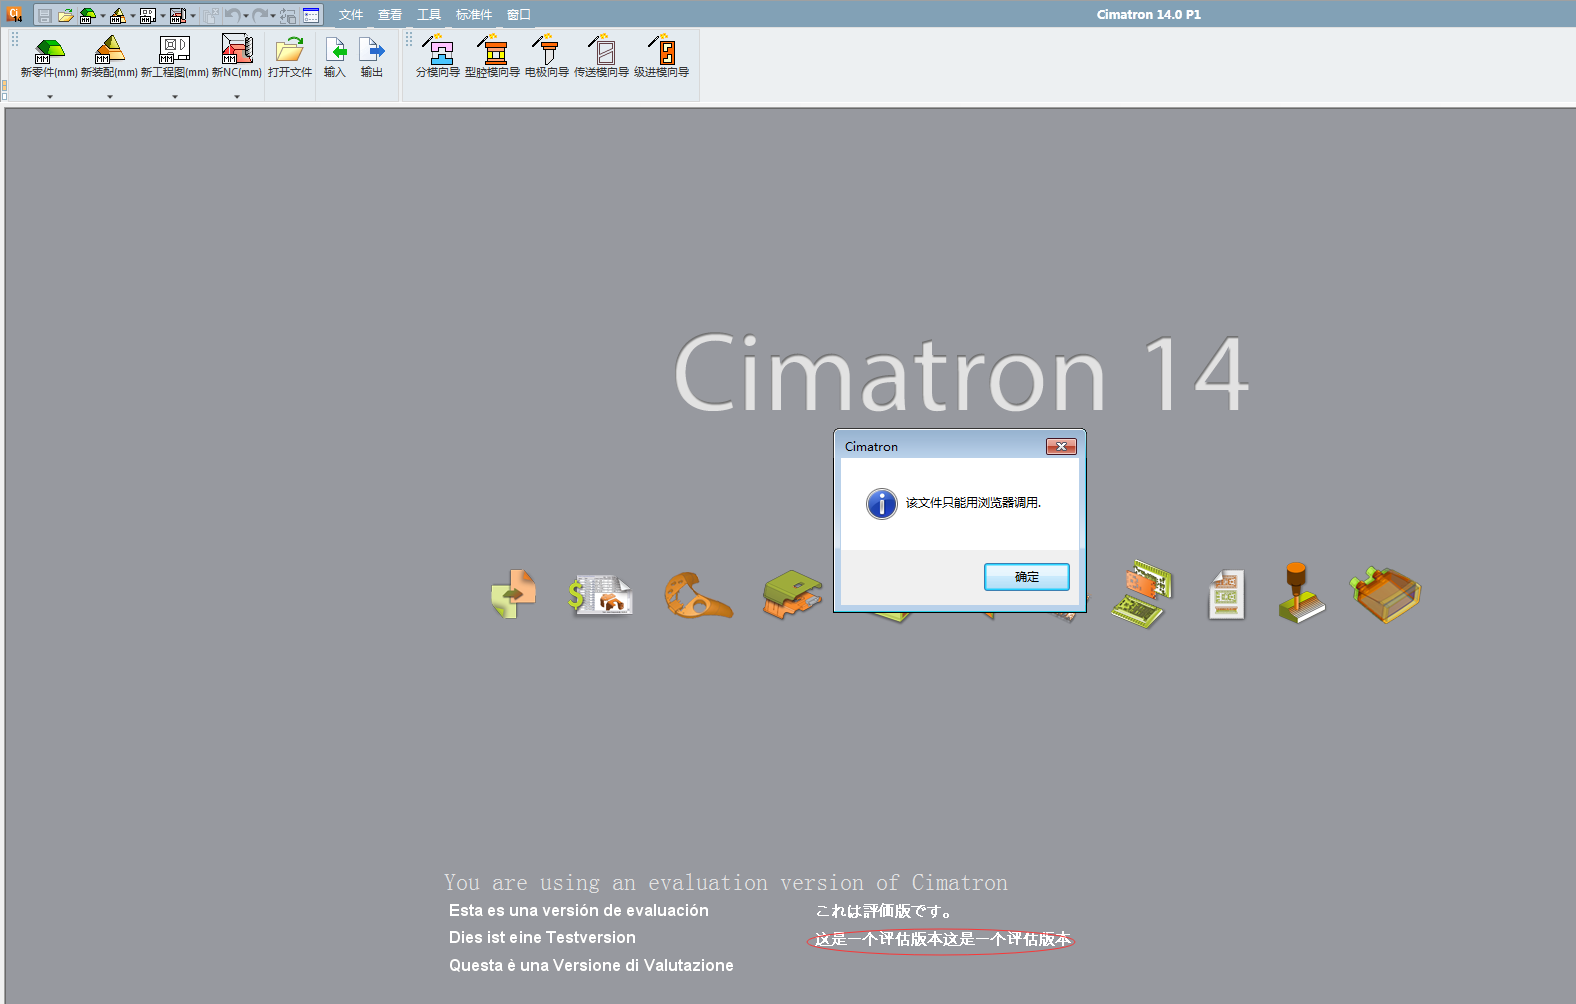 Cimatron 14